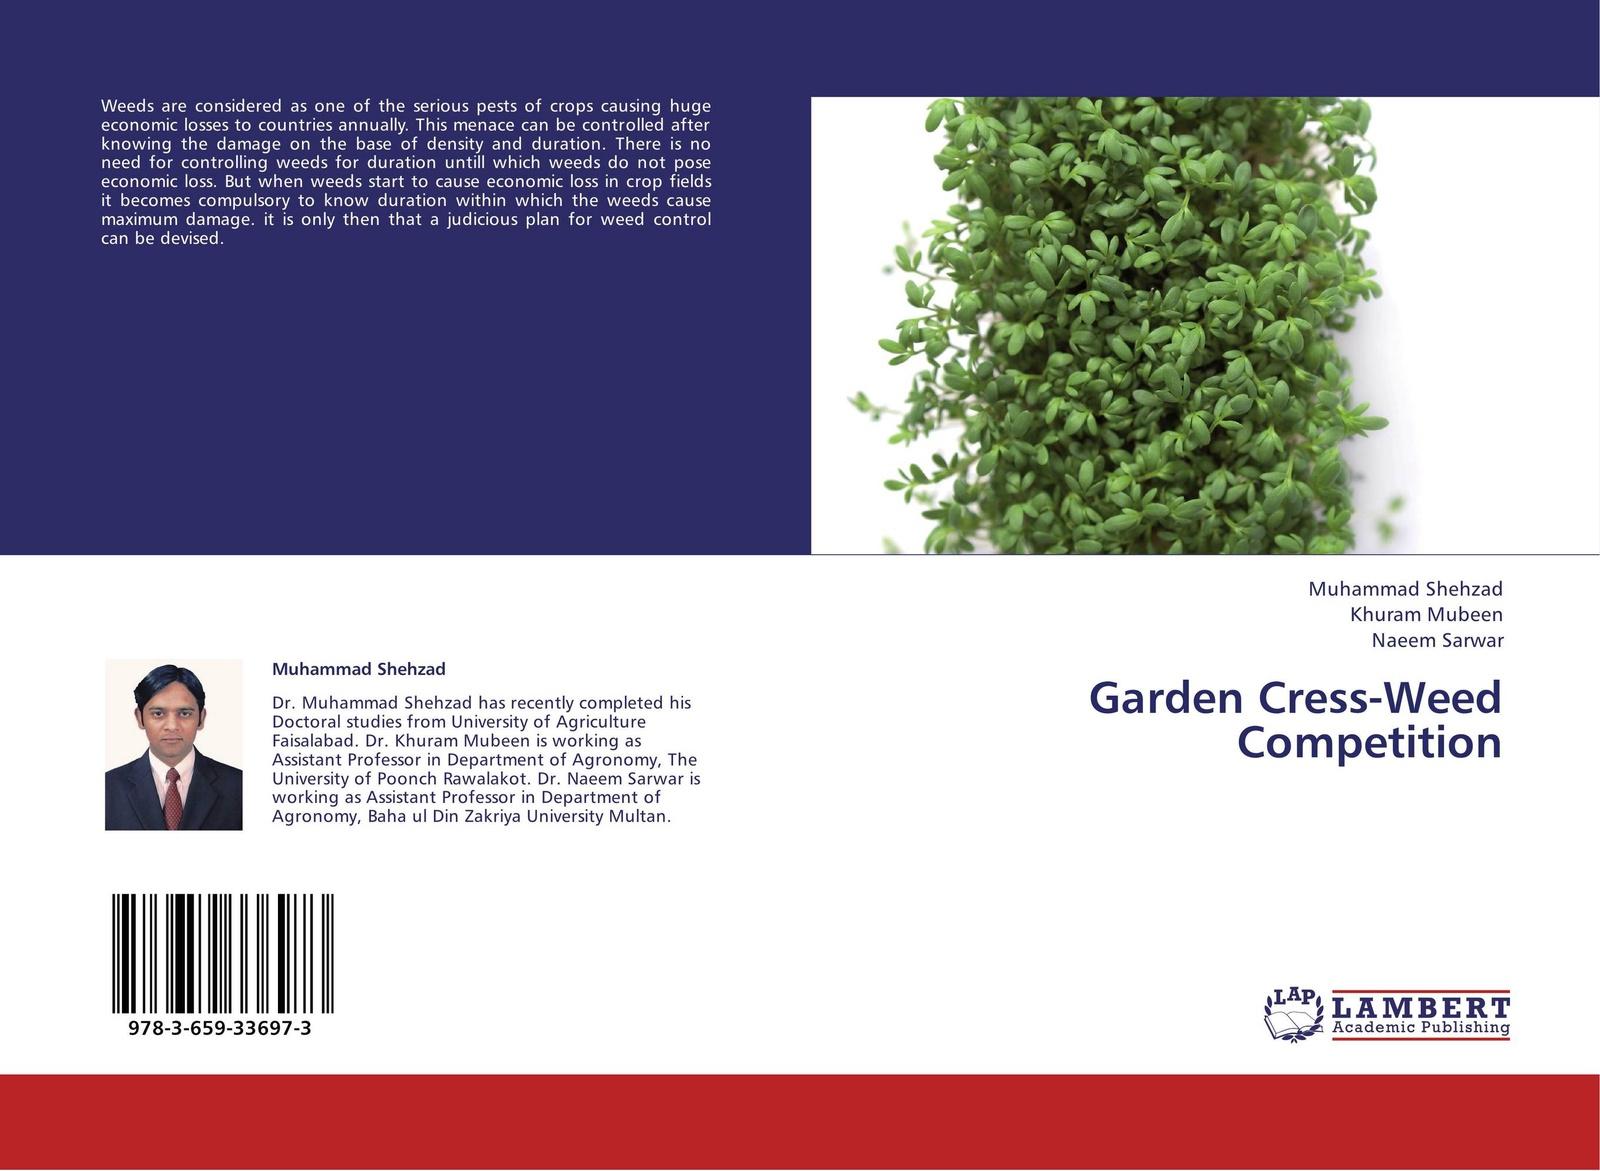 Muhammad Shehzad,Khuram Mubeen and Naeem Sarwar Garden Cress-Weed Competition gunter nitsch weeds like us